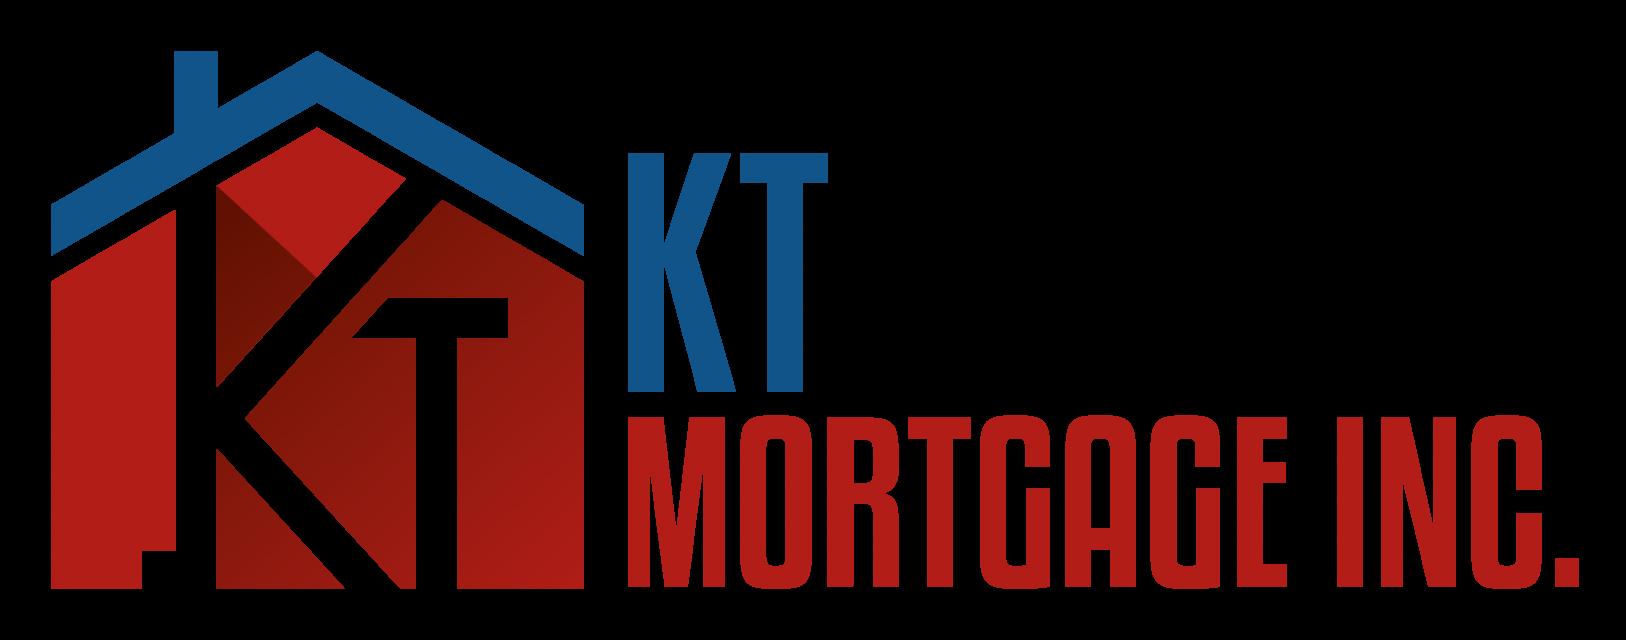 KT Mortgage Inc